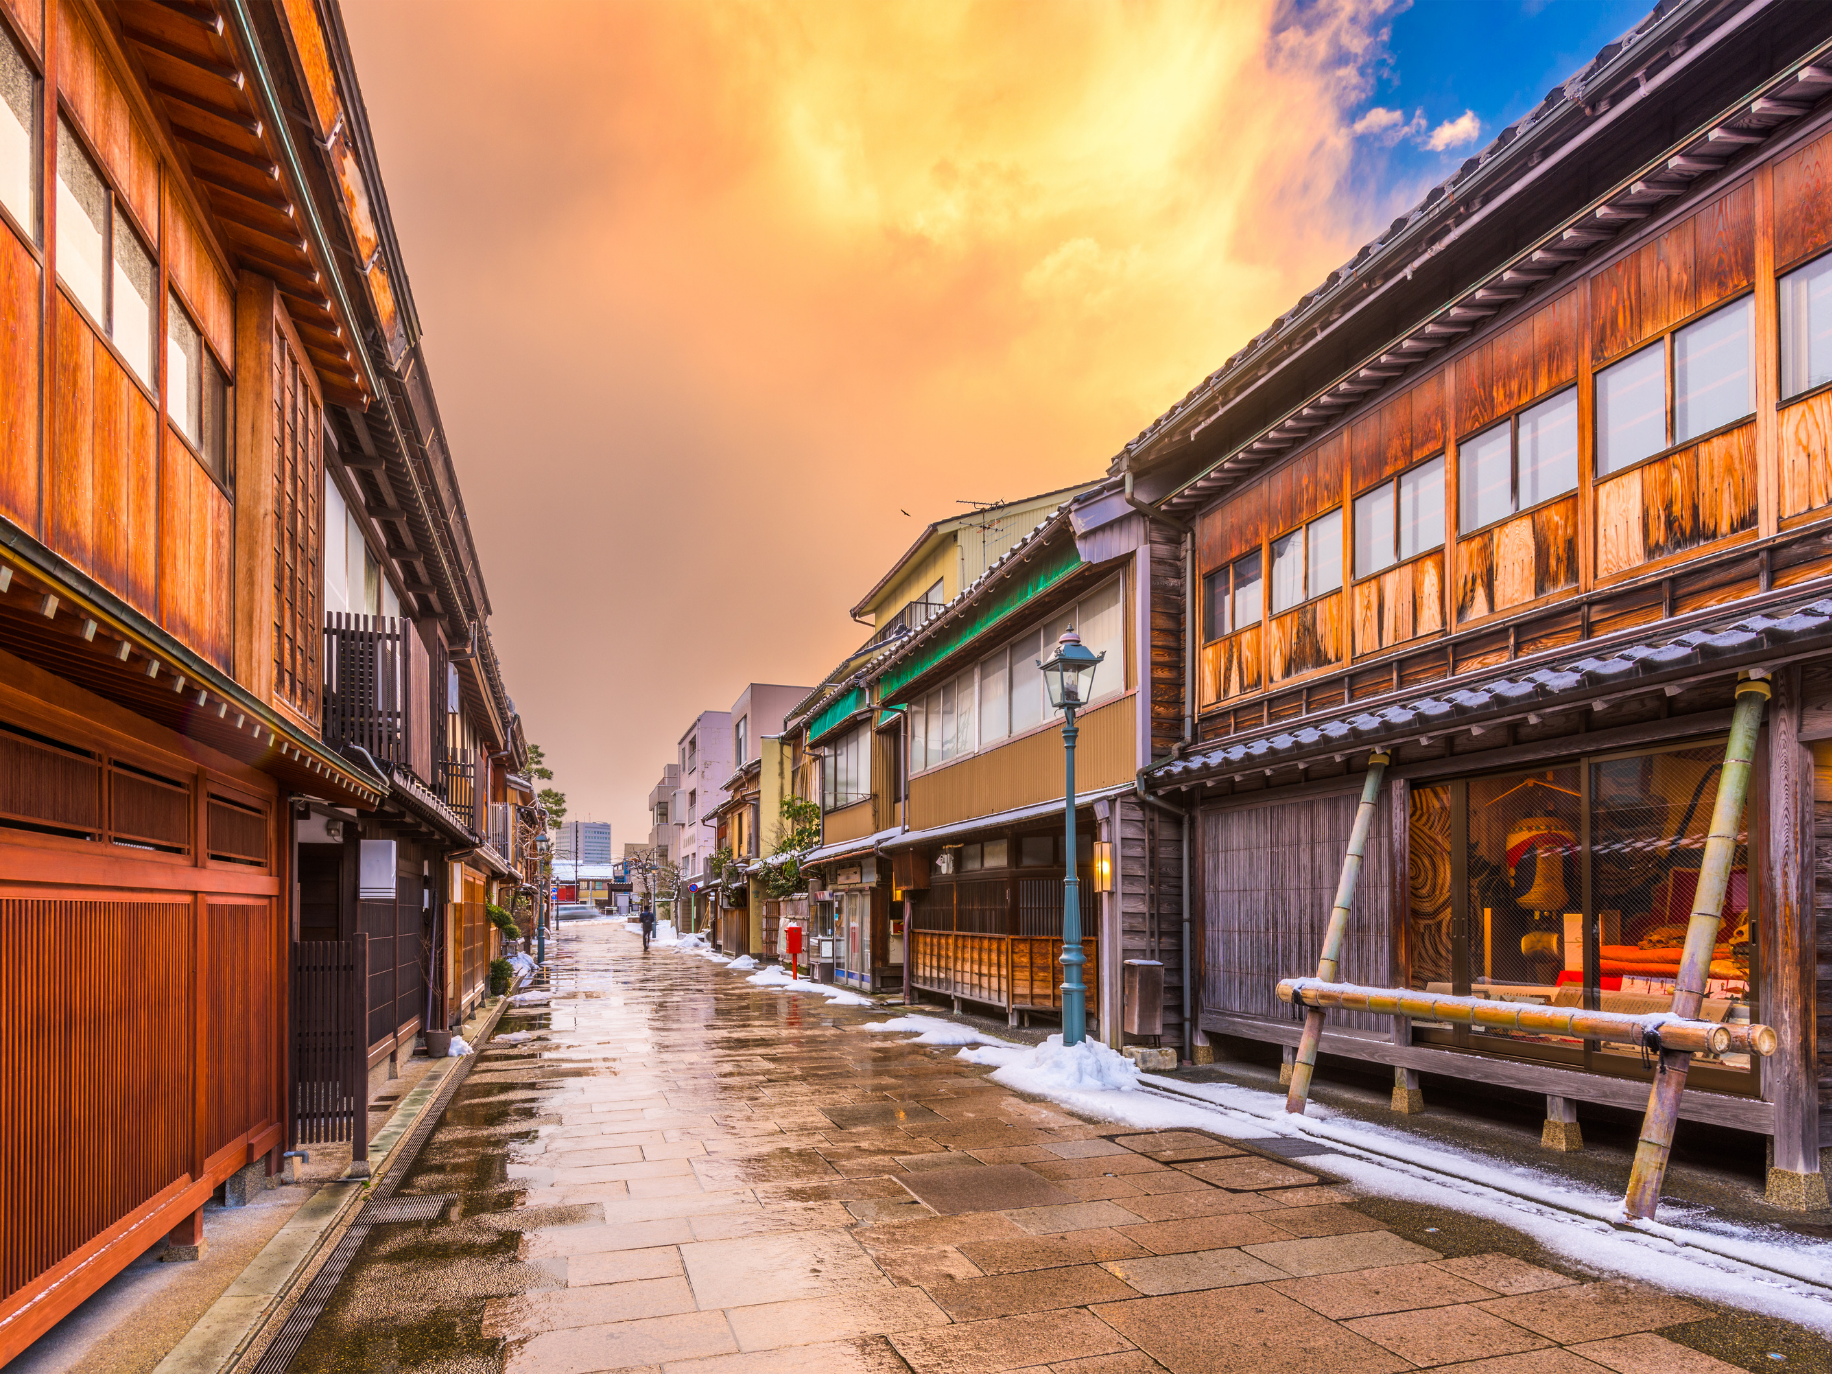 Higashichayagi: Kanazawa's Geisha District